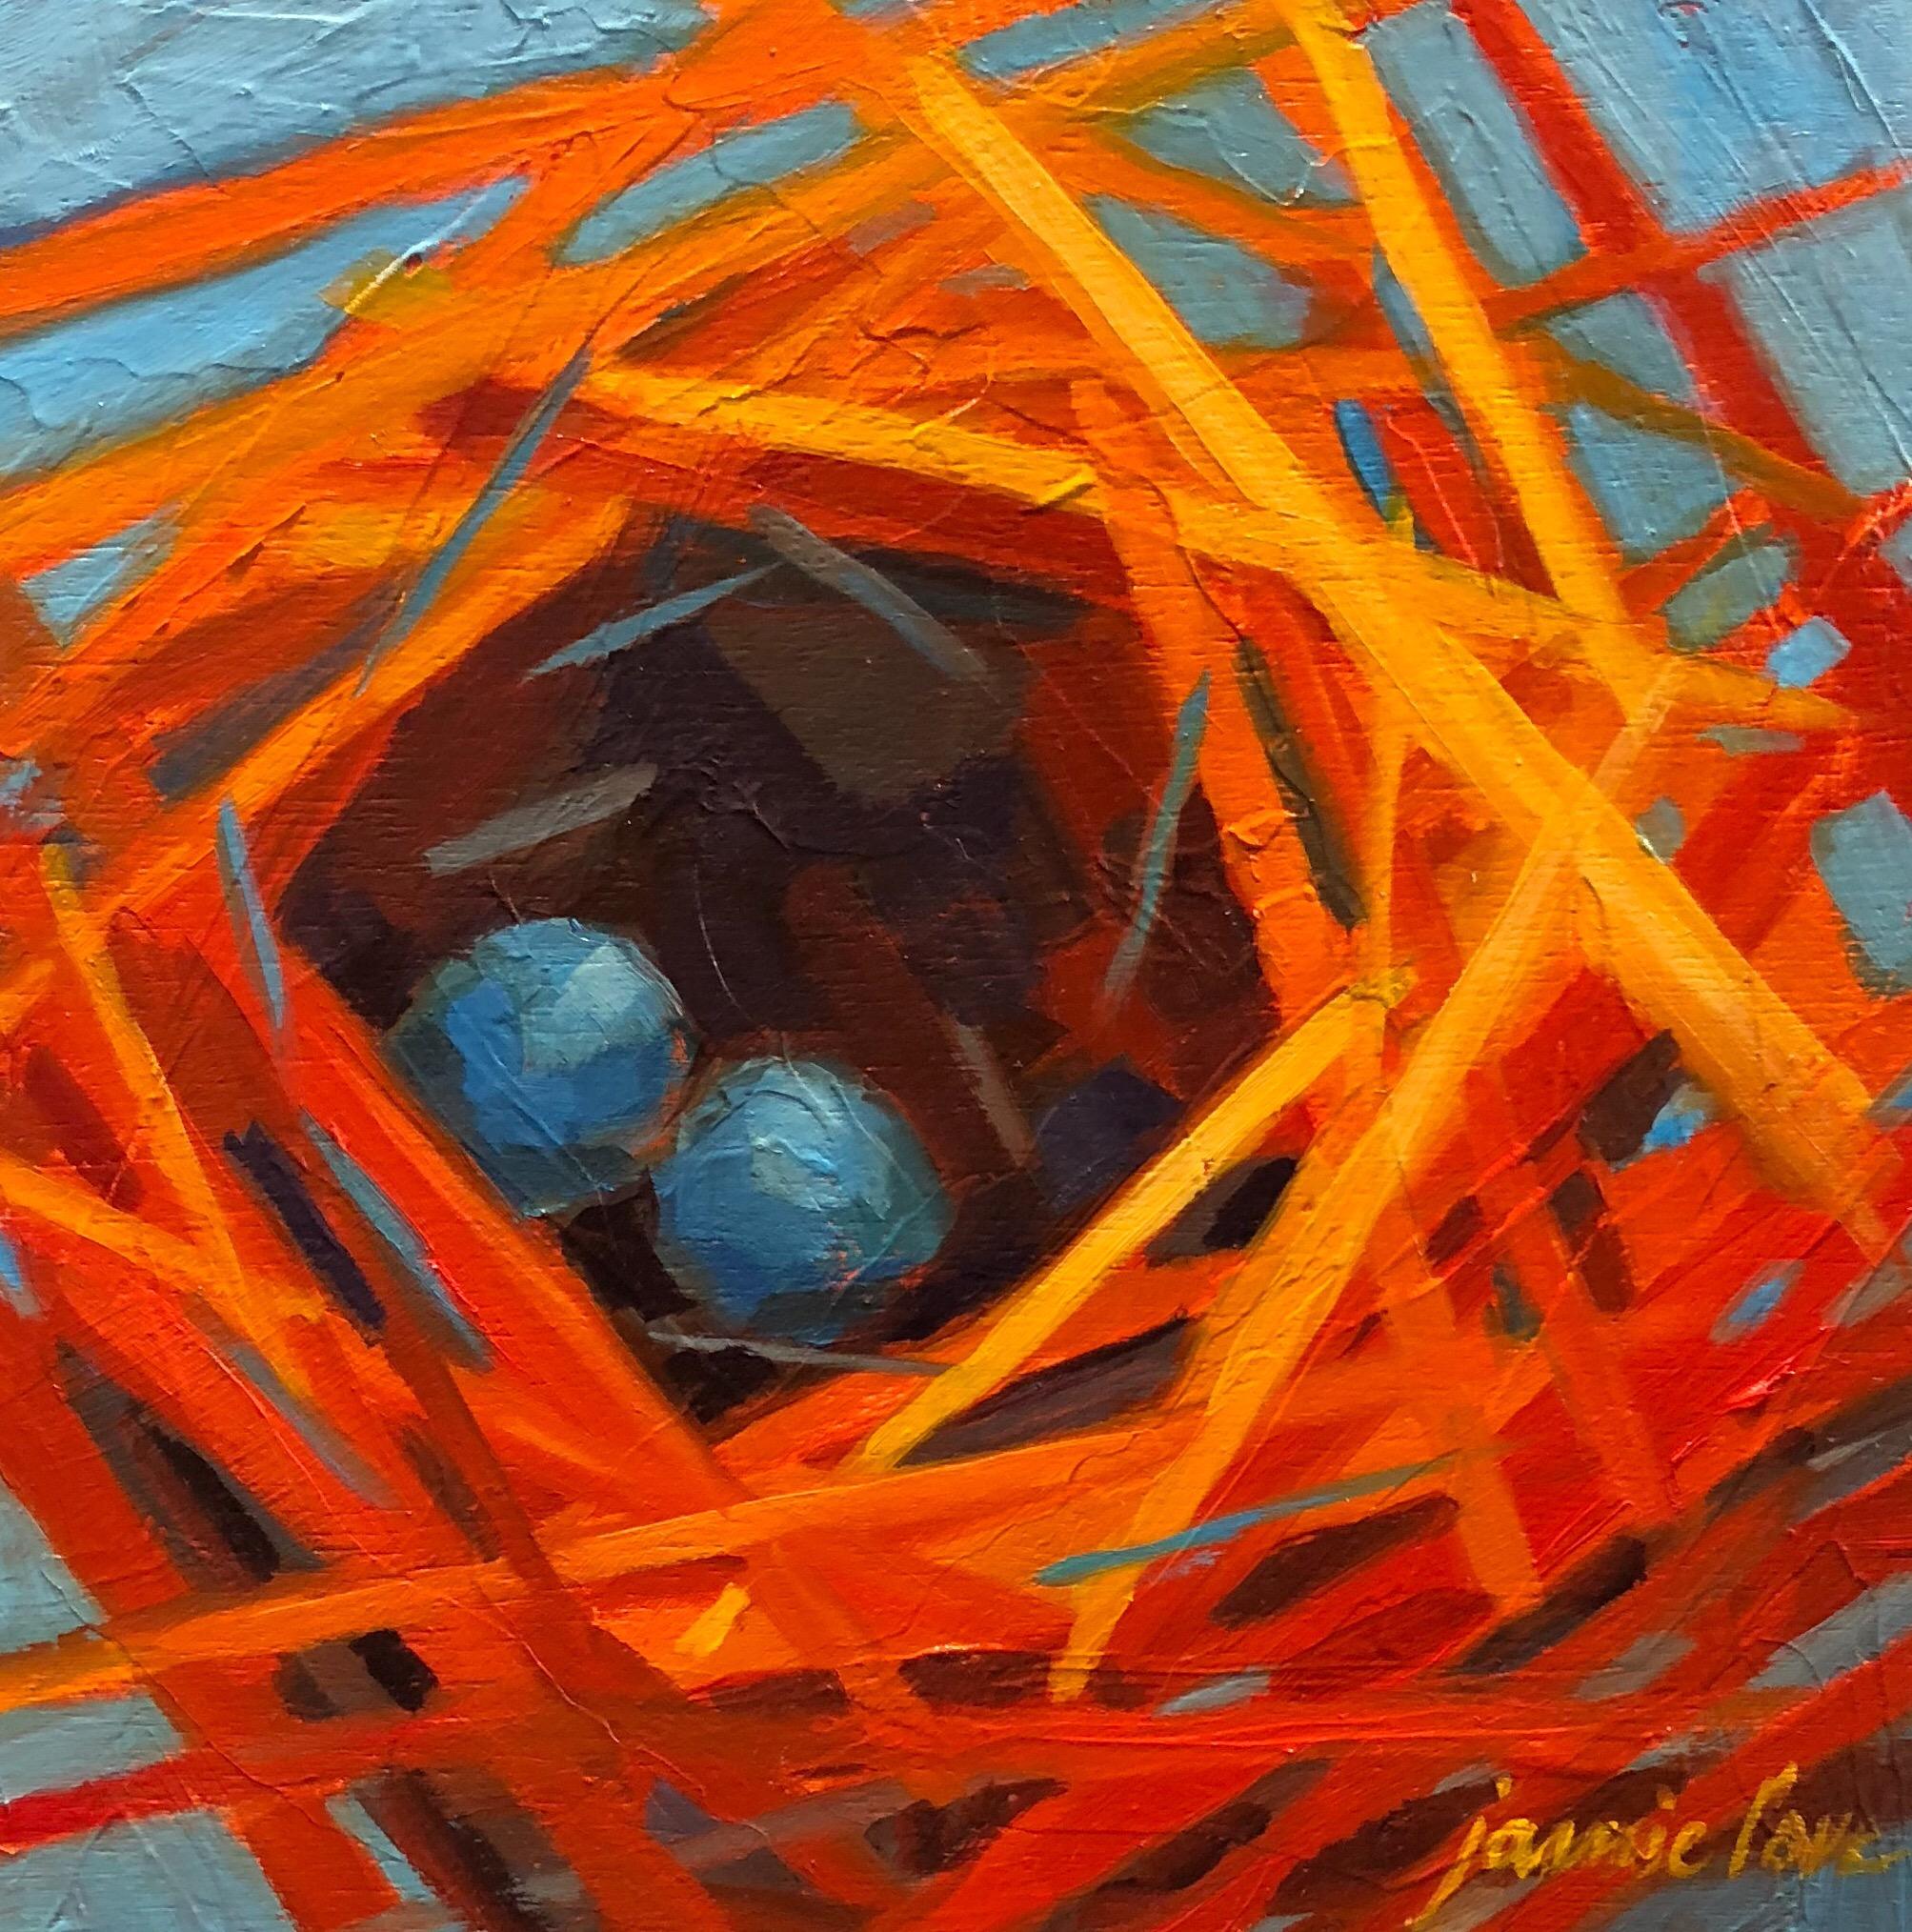 Abstract Orange Nest (SOLD)